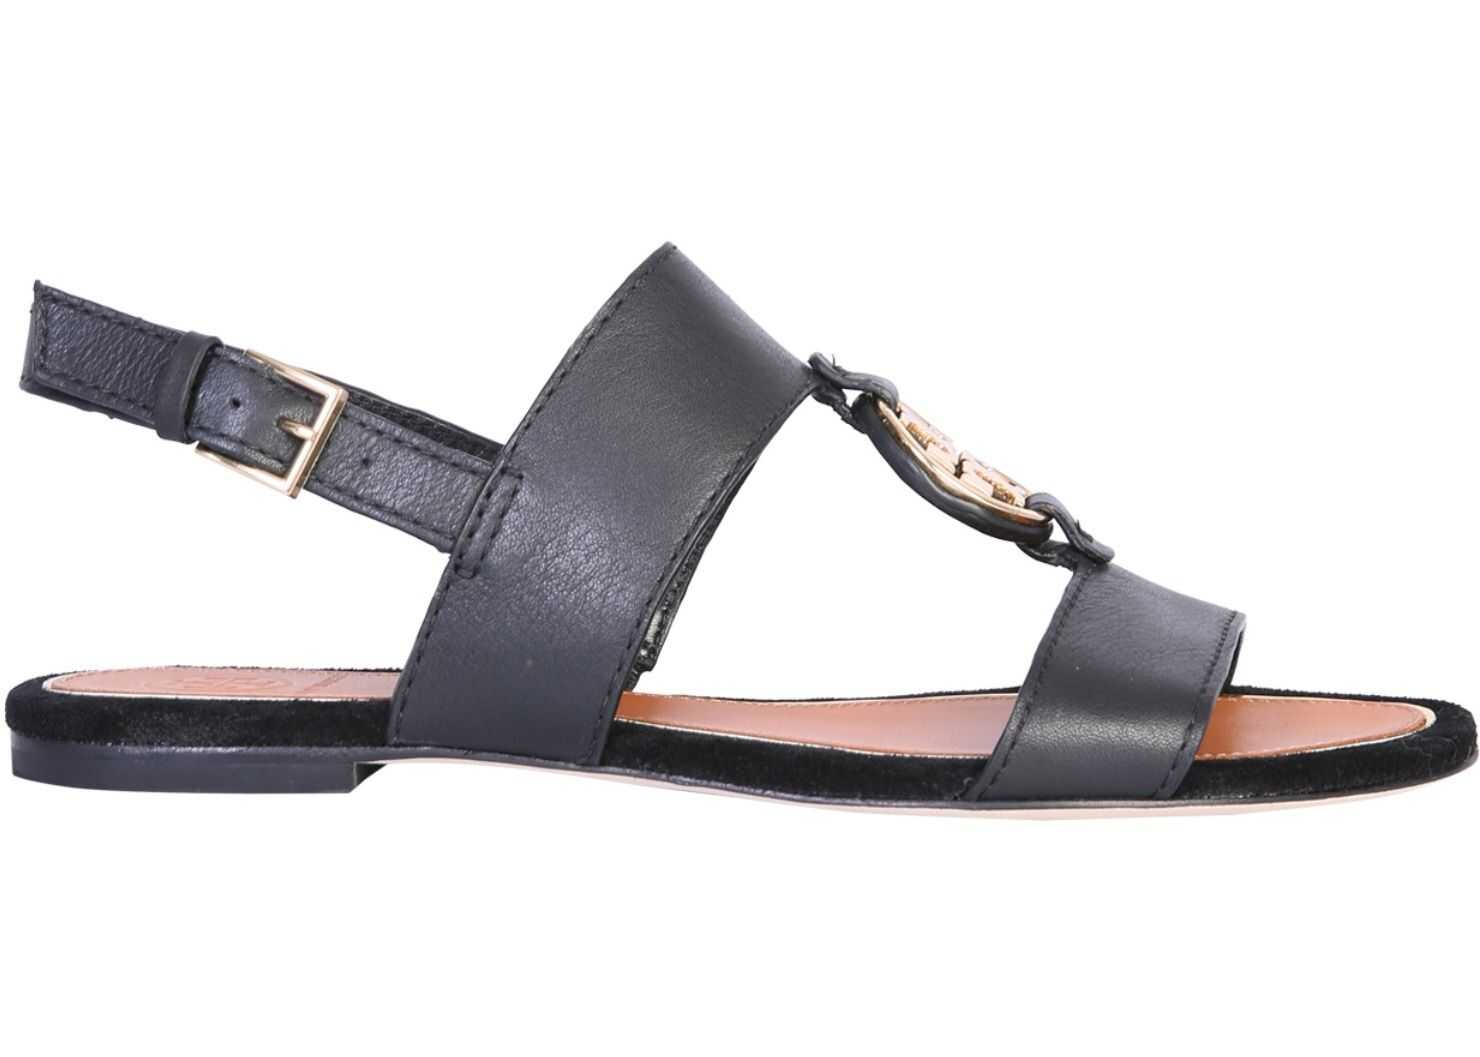 Tory Burch Sandal With Logo BLACK